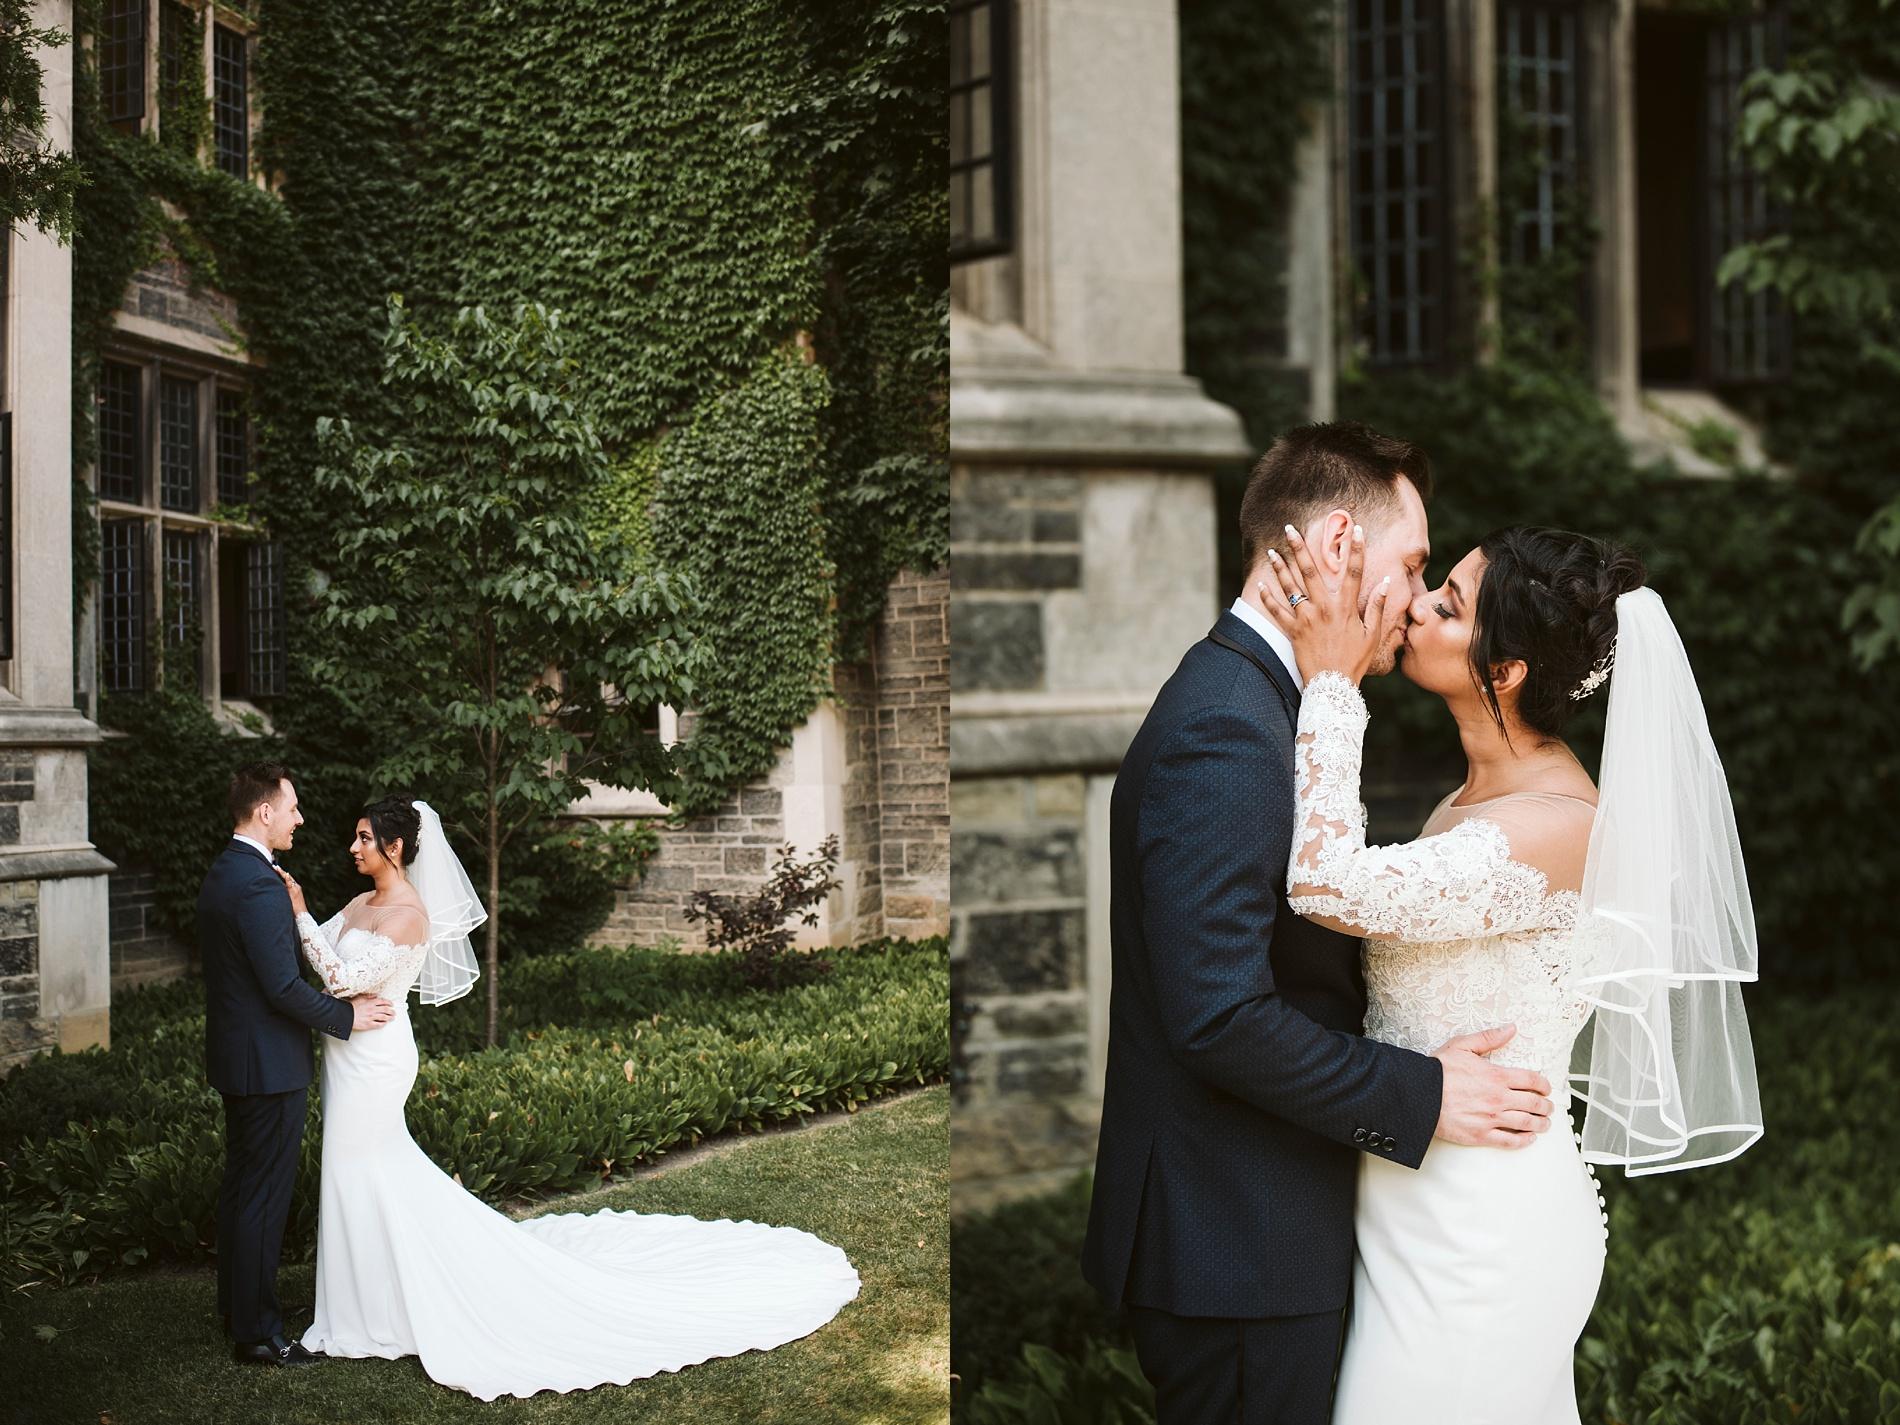 Eglington_Grand_Wedding_Photographer_0064.jpg